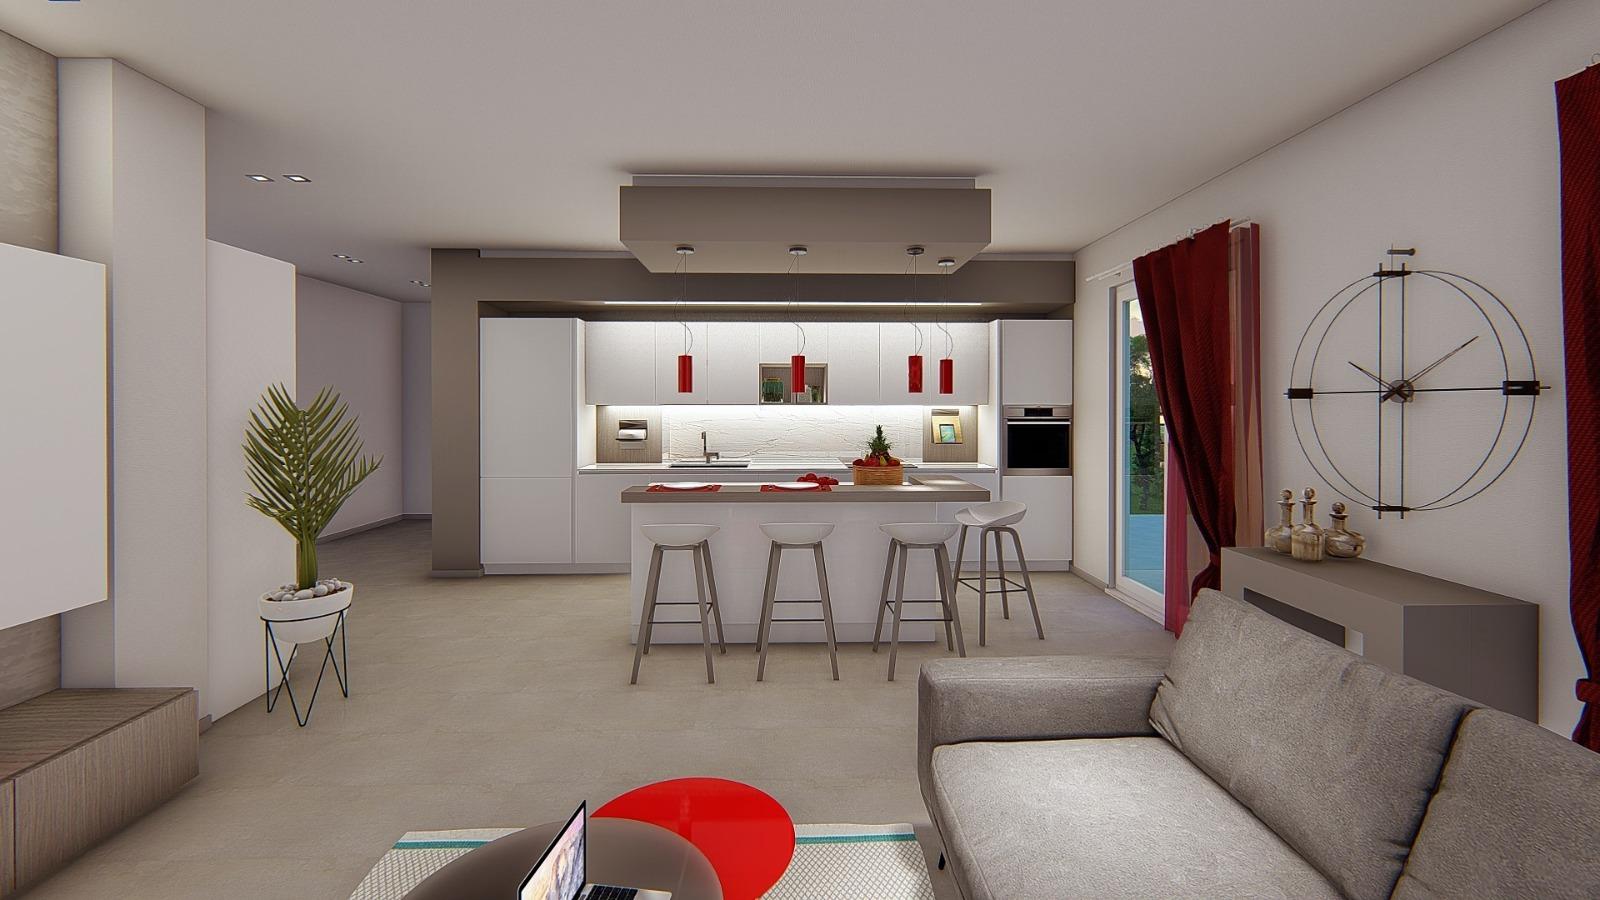 Cucina e Living in open space